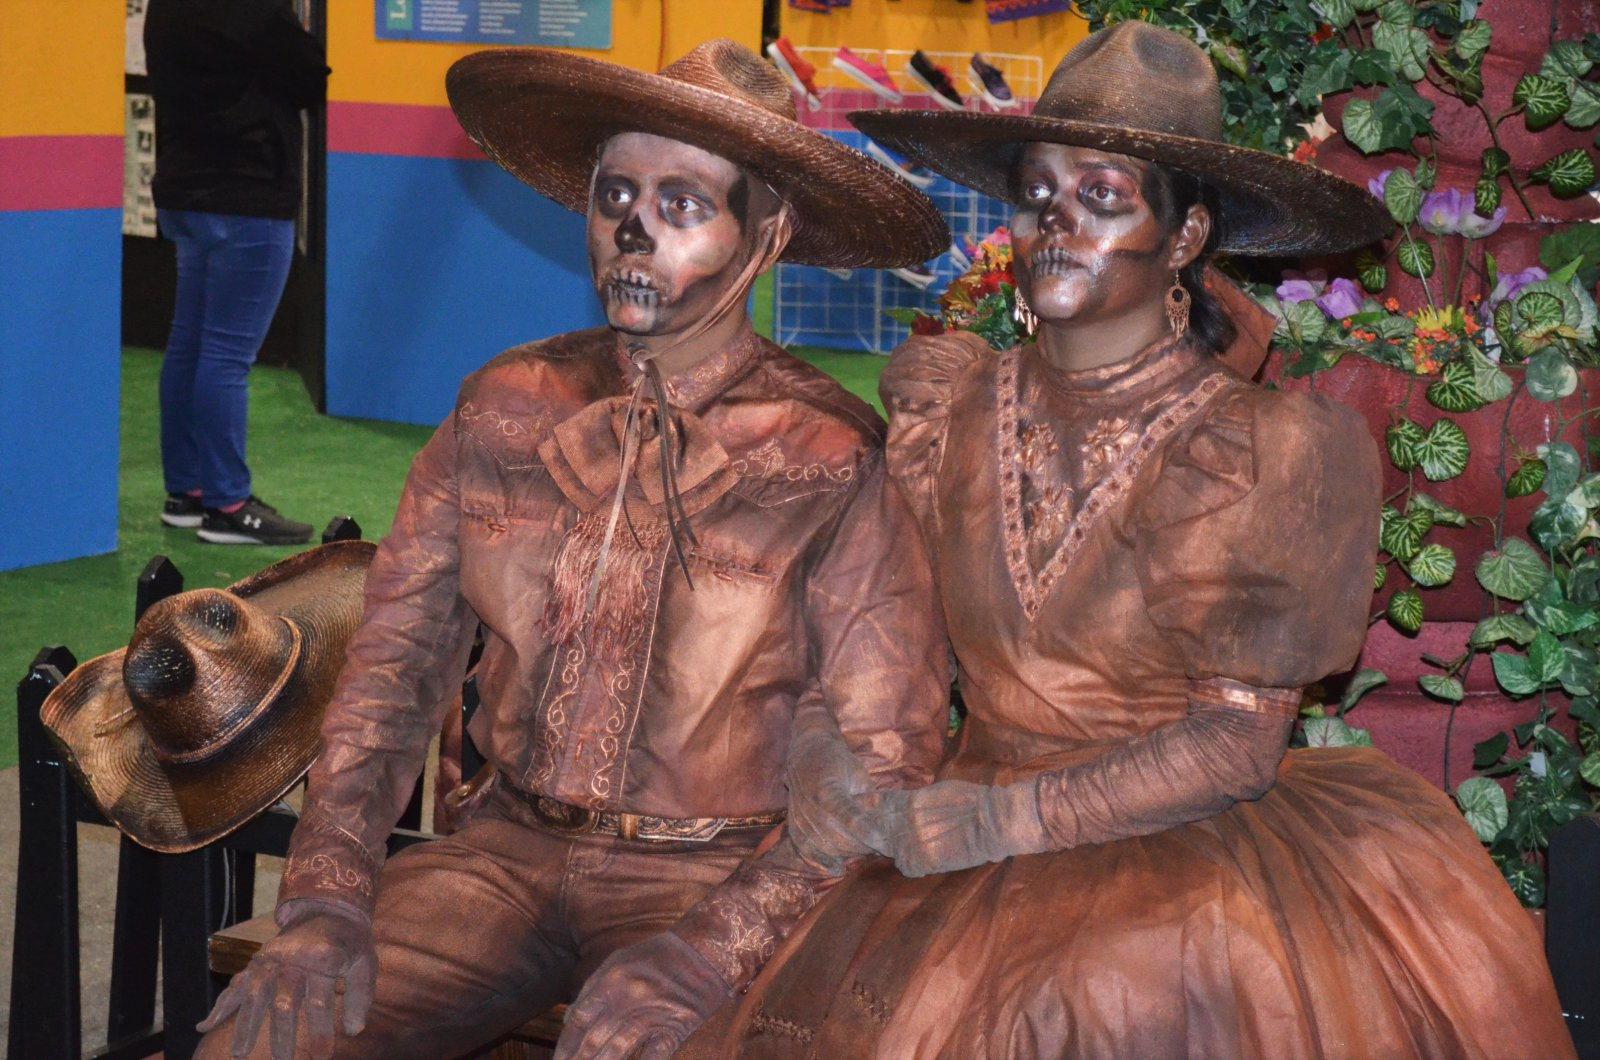 Mexican Fiesta Cultural Pavilion